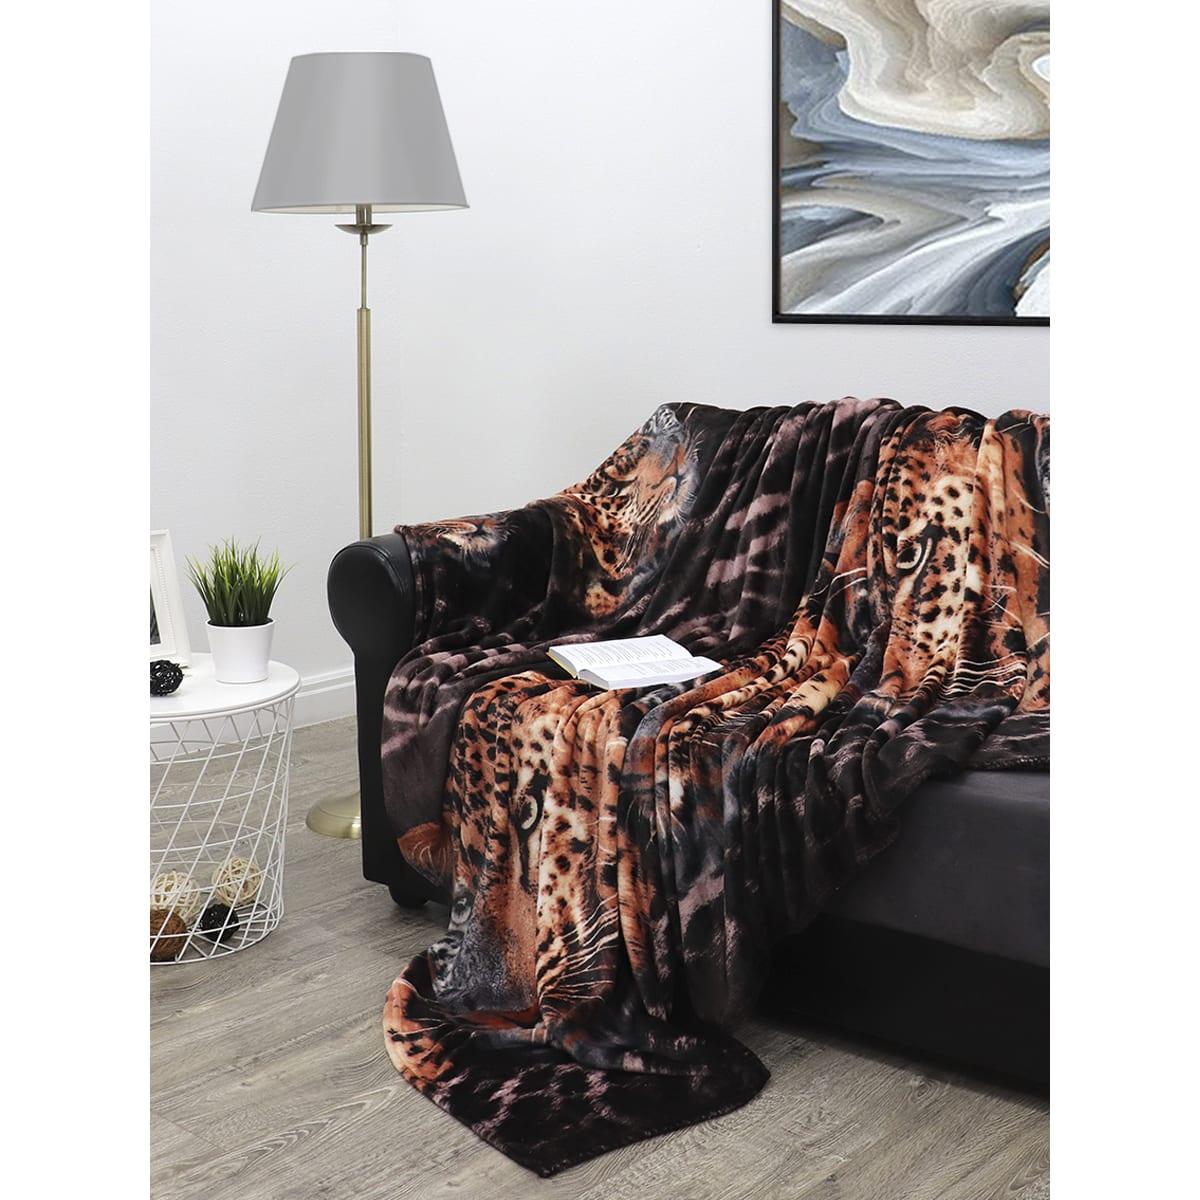 Плед TexRepublic Absolute flannel 17277 180х210 см, фланель